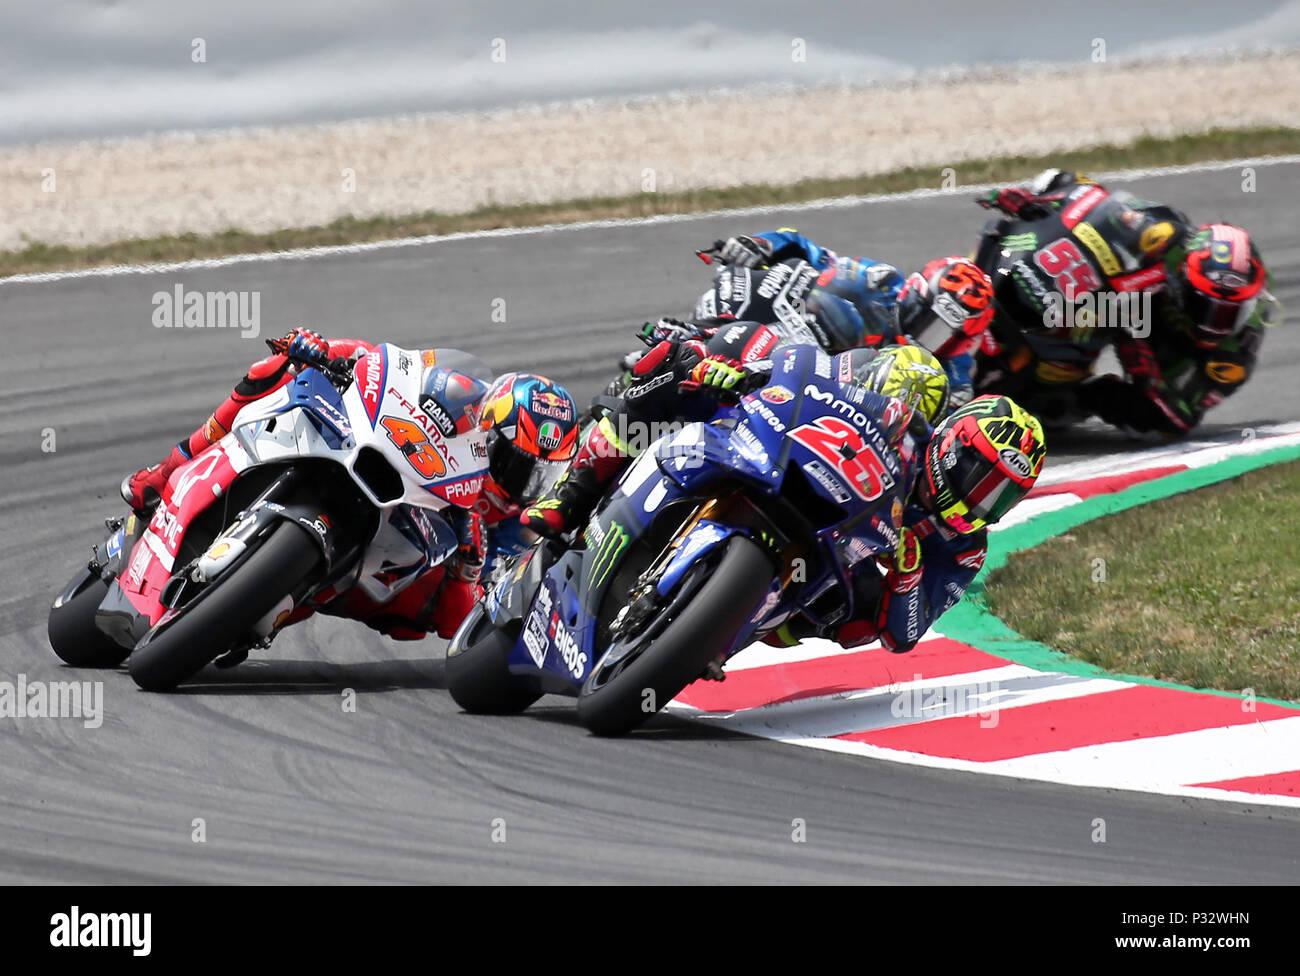 Barcelona -17th June 2018- SPAIN: Maverick Vinales (Movistar Yamaha) during  the GP Catalunya Moto GP, in the Barcelona-Catalunya Circuit, on 17th June 2018. Photo: Joan Valls/Urbanandsport/Cordon Press - Stock Image